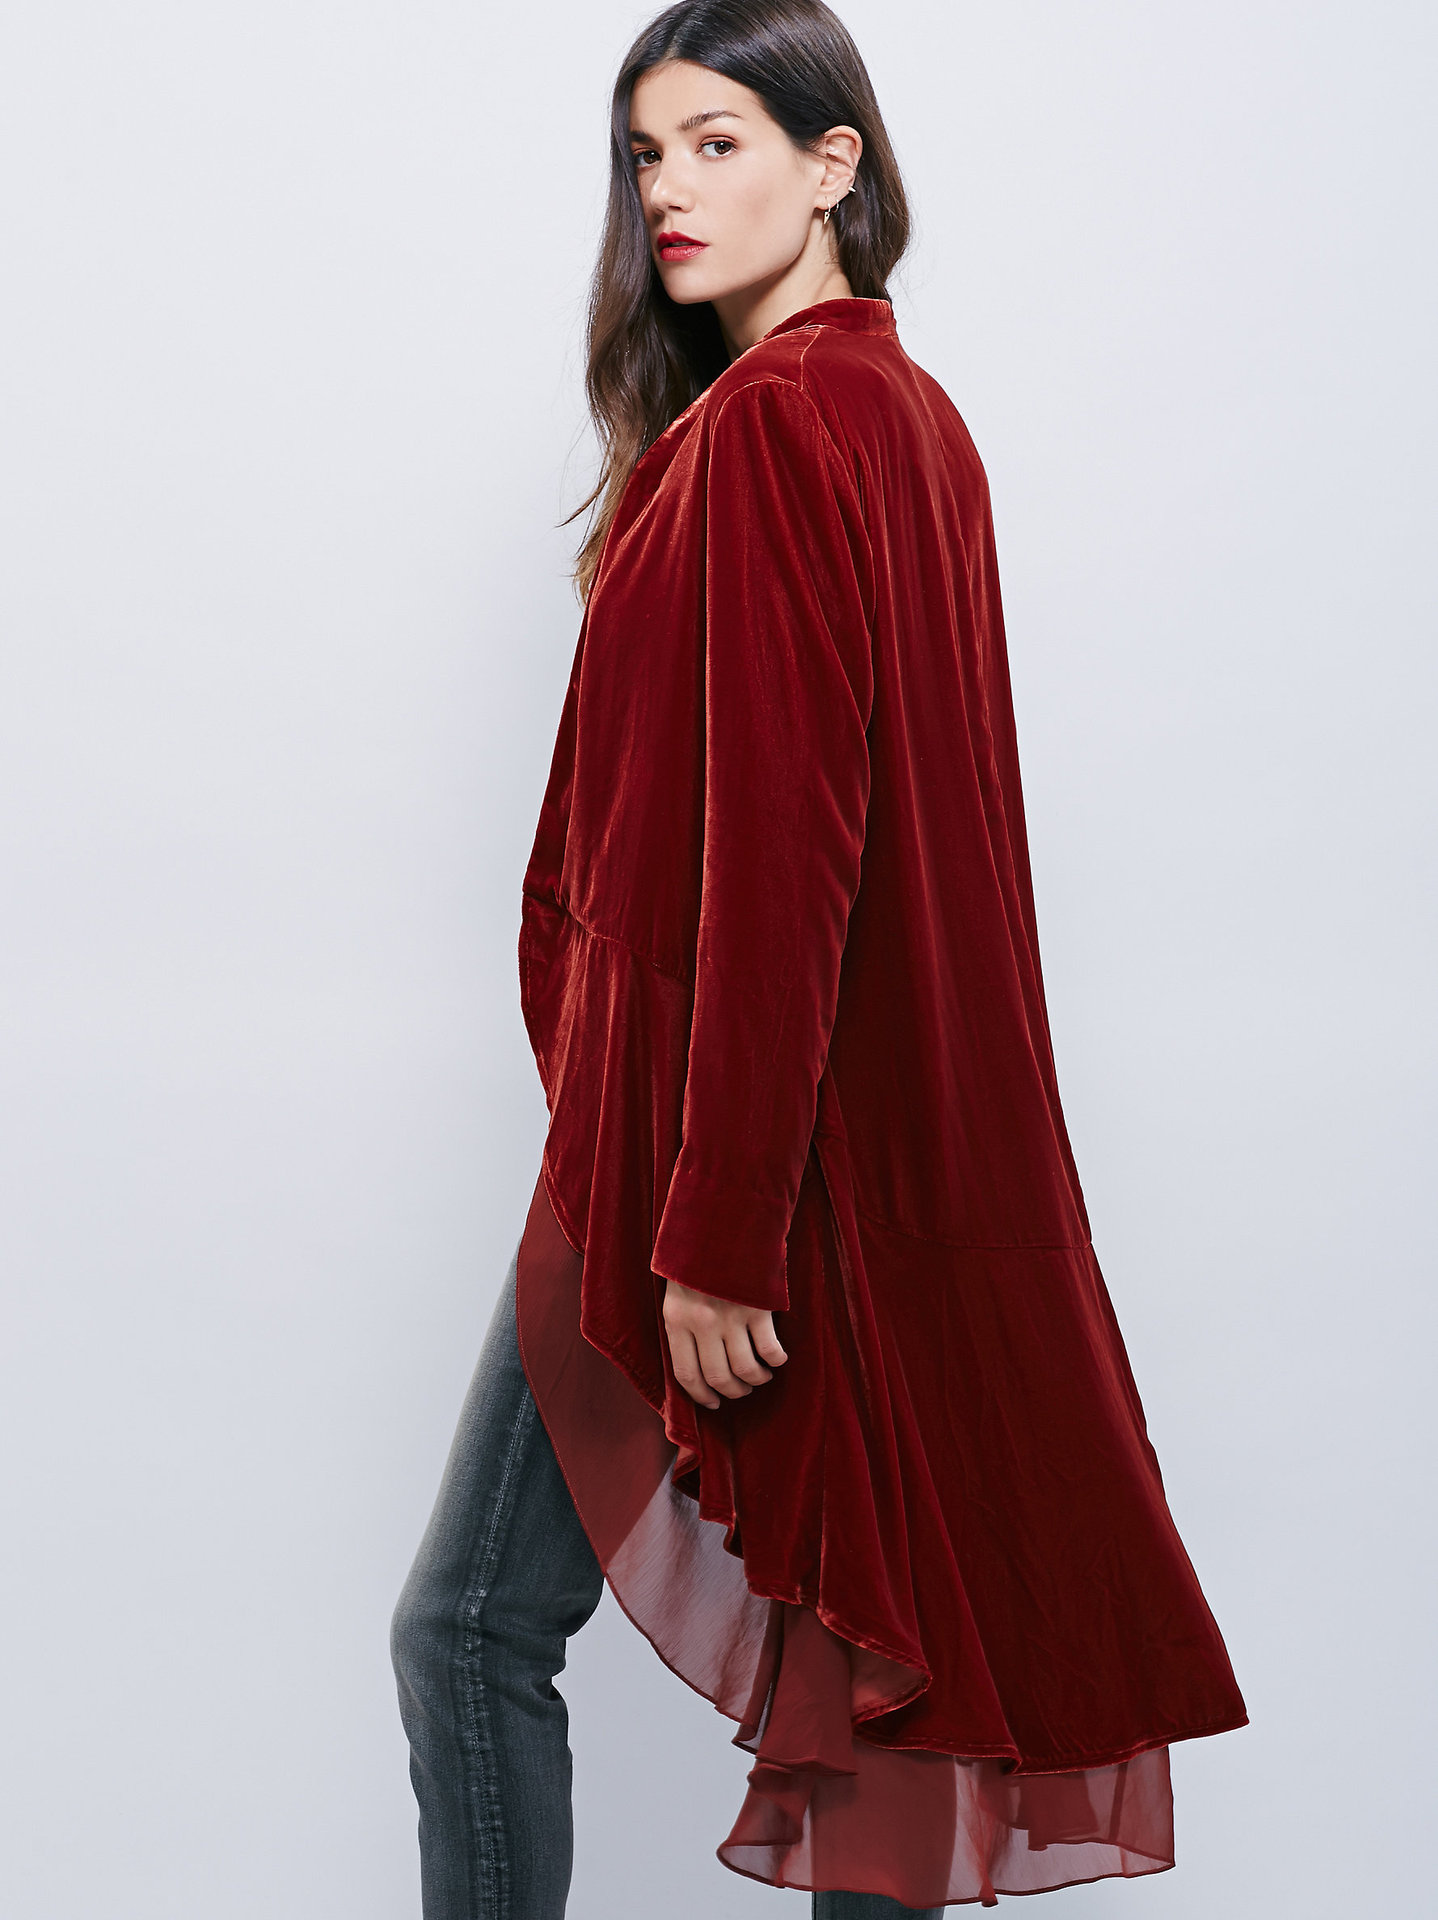 People Vintage Long Velvet Coat Winter Casual Ruffle Long   Trench   Coat for Women Autumn Open Stitch Windbreaker Coat Trenchcoat